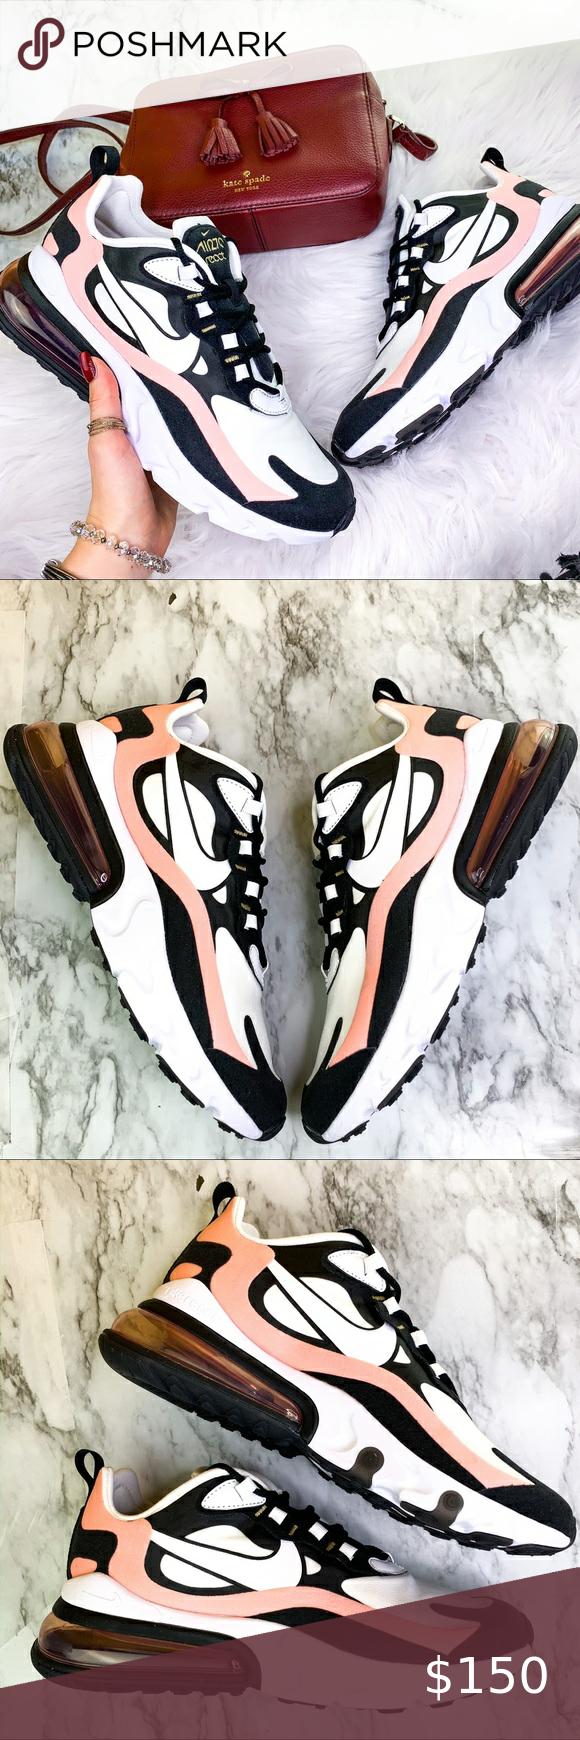 Nike Air Max 270 React Pink/White Sneaker in 2020 Nike